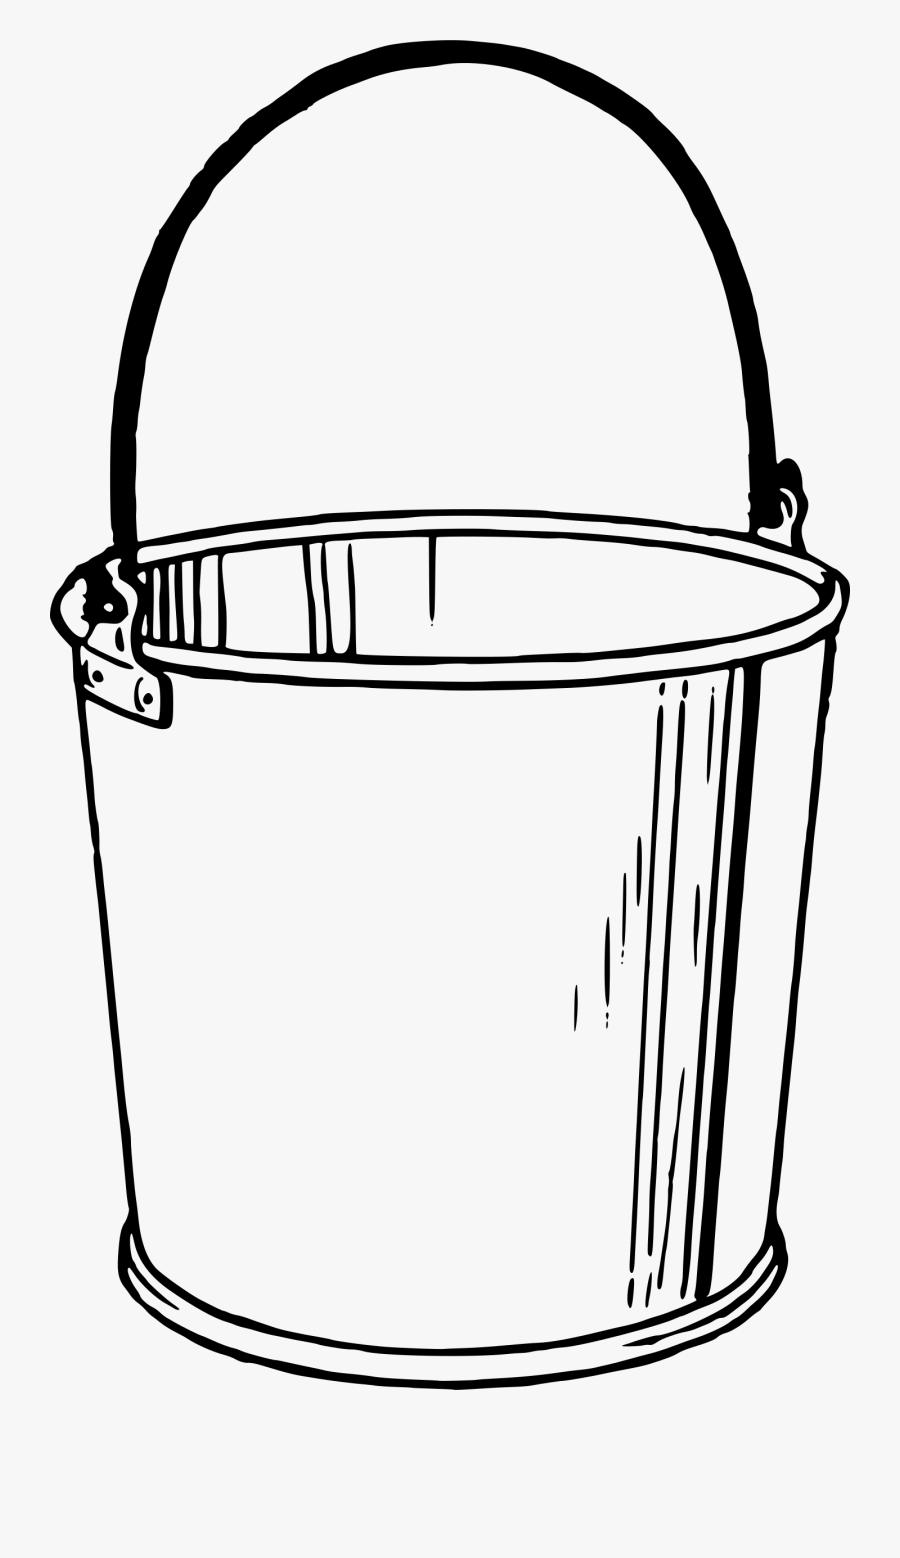 Clipart Bucket - Bucket Drawing, Transparent Clipart